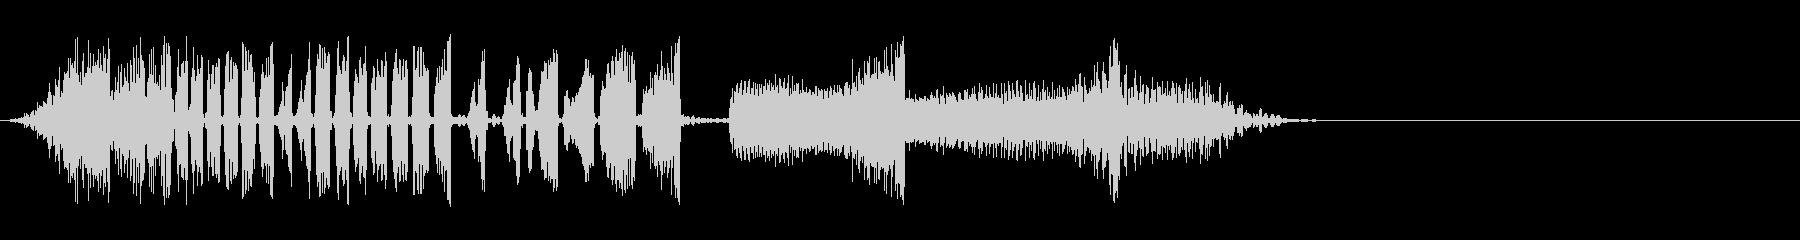 DJスクラッチ04_リバース音04の未再生の波形